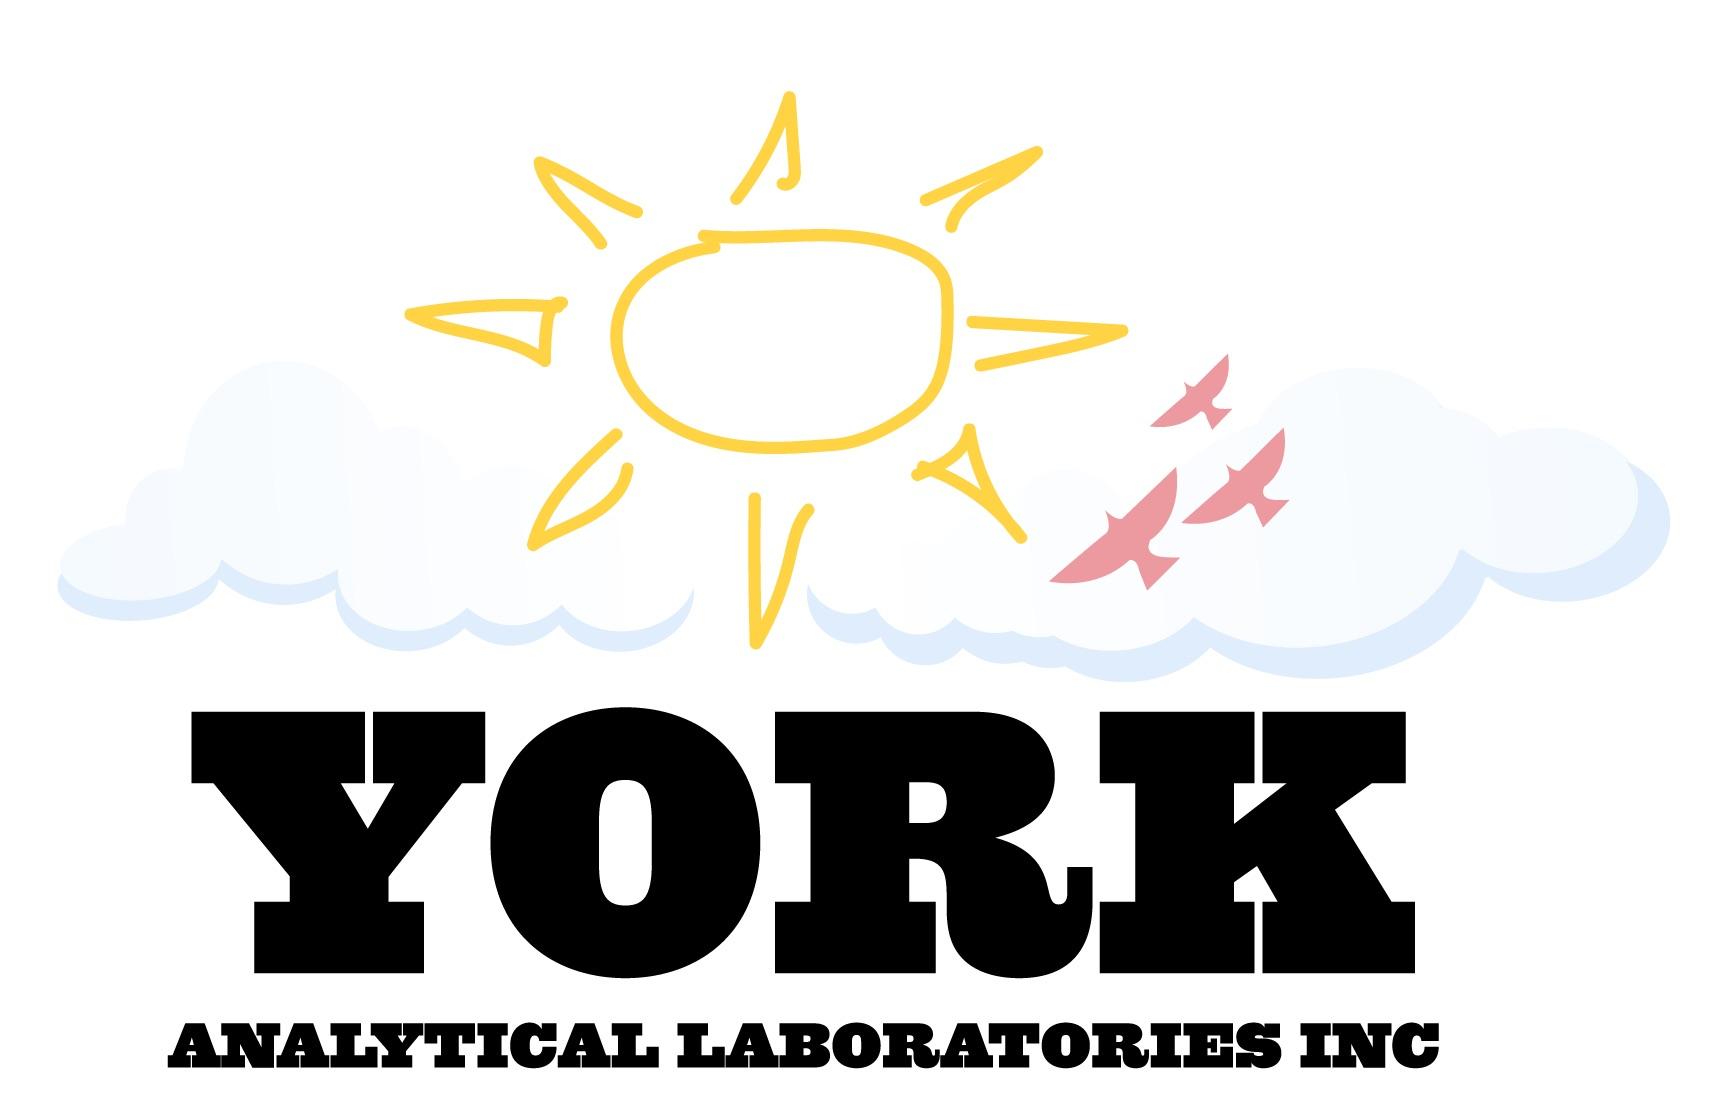 York Lab Analytical Laboratories Inc.